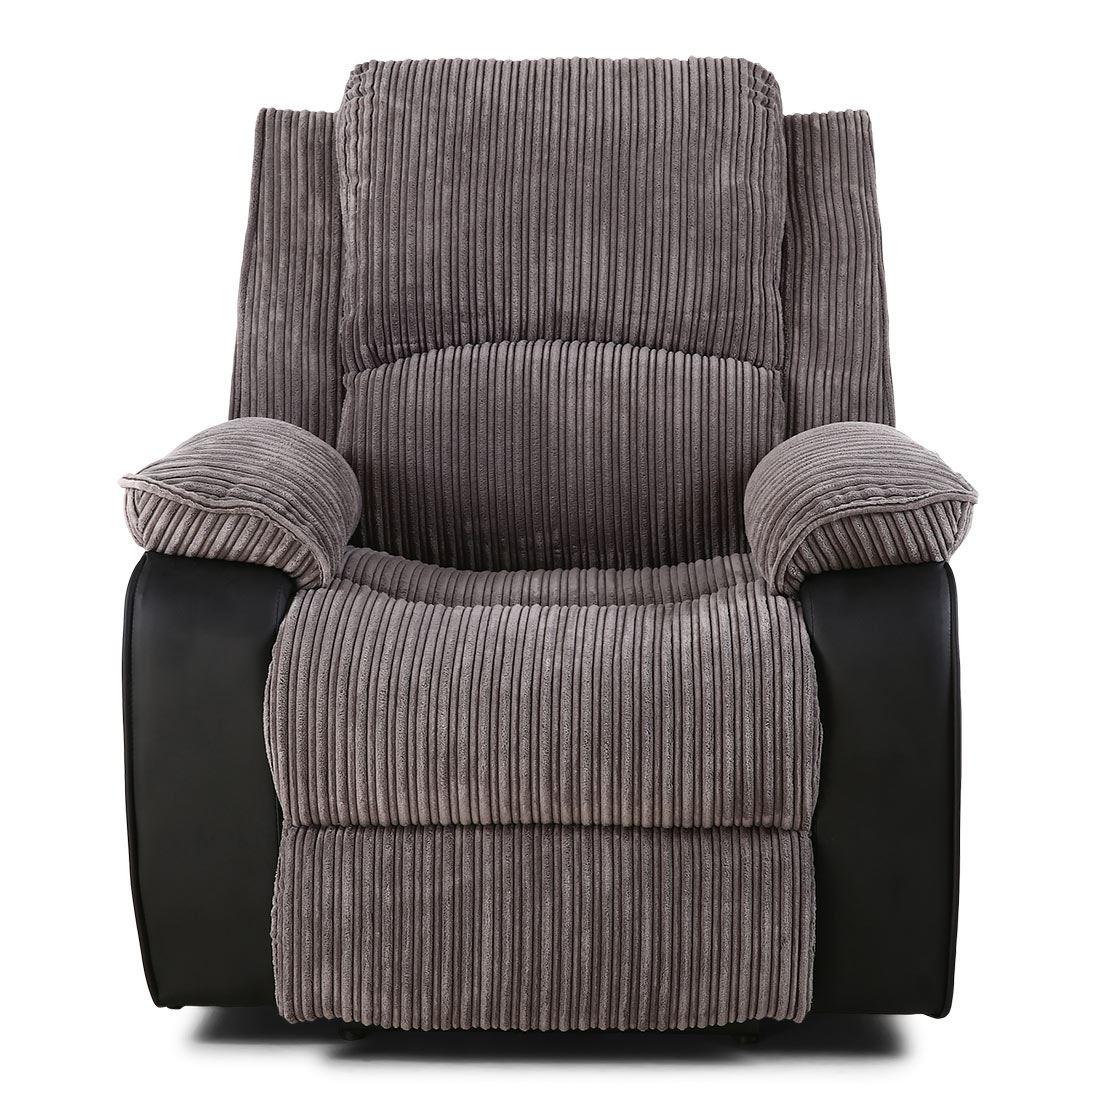 power recliner chairs uk girls table and postana jumbo cord fabric armchair electric